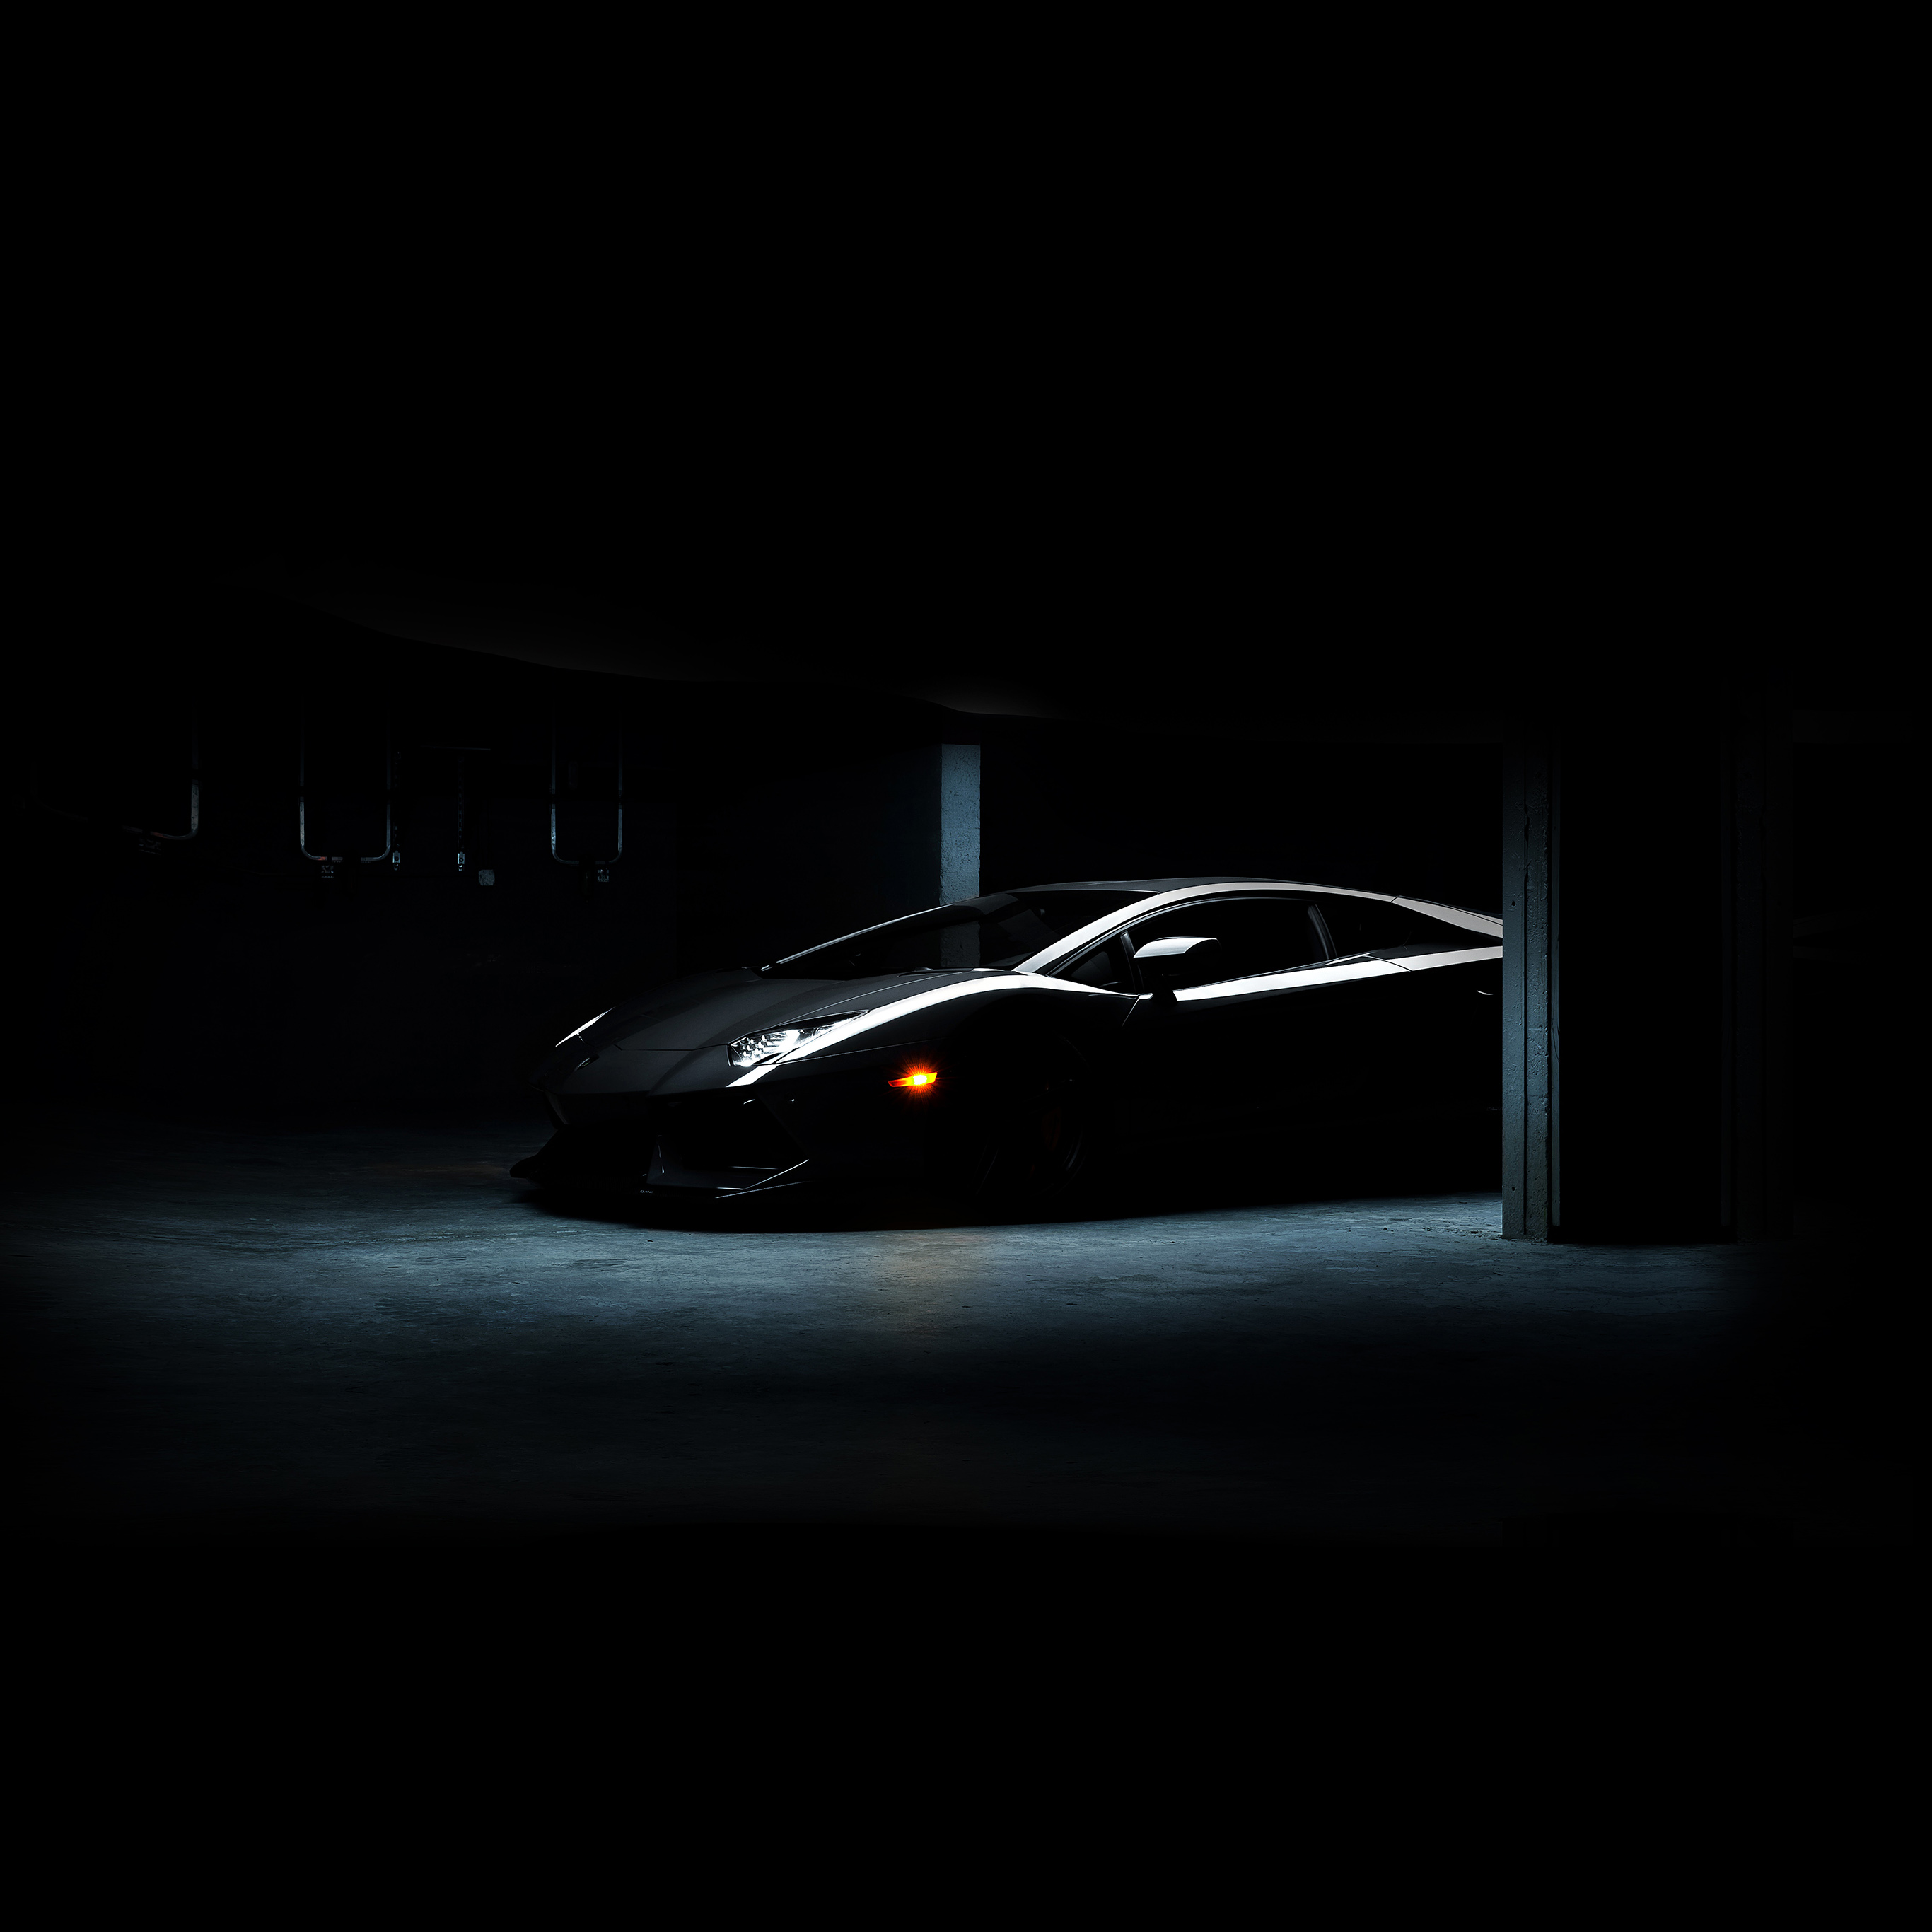 Awesome Mac Wallpapers Hd: Ak64-lamborghini-car-dark-black-awesome